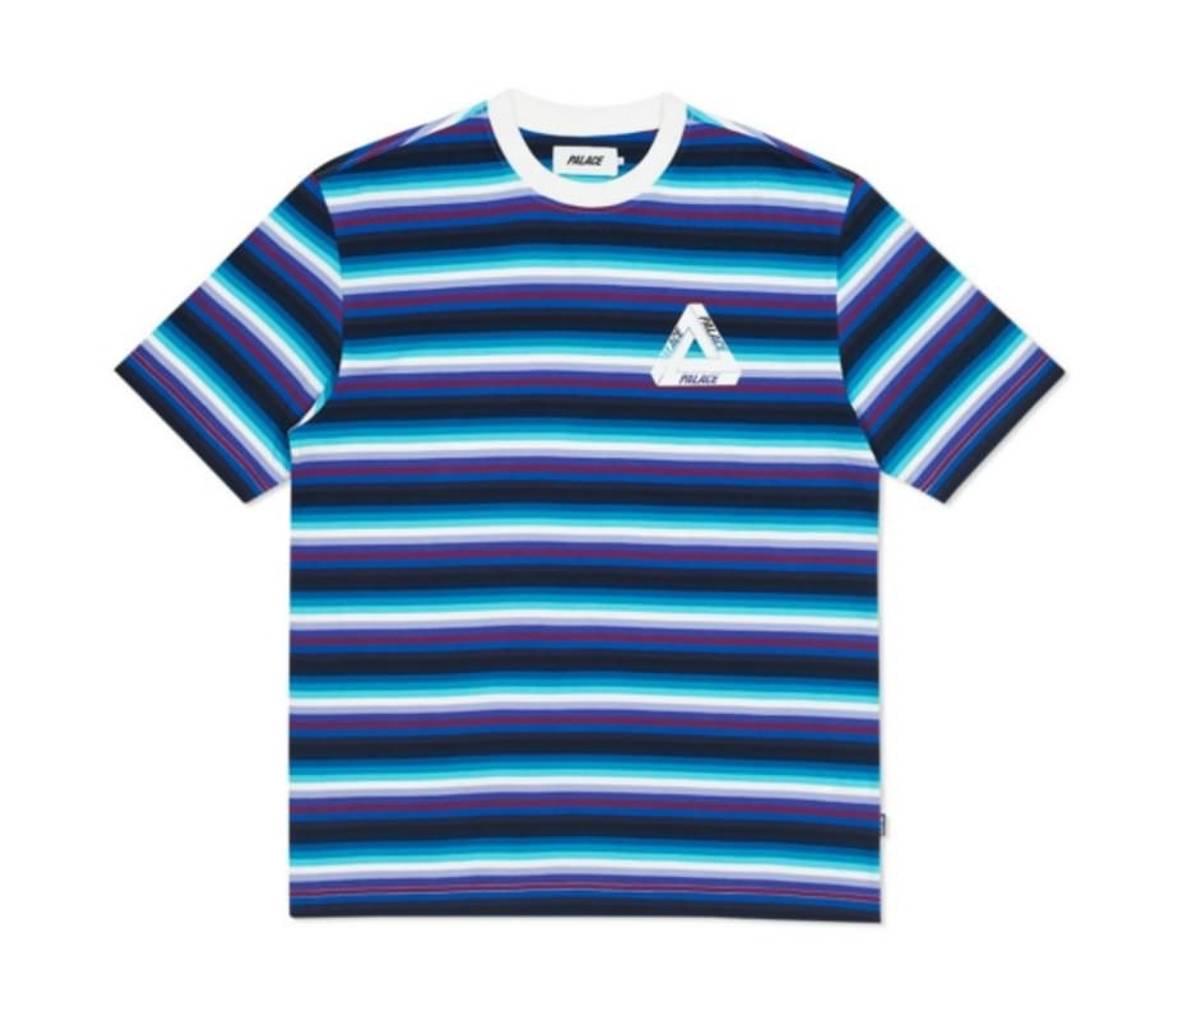 b240640b117b Palace Palace Thin Stripe Tri Ferg Tee Size m - Short Sleeve T-Shirts for  Sale - Grailed